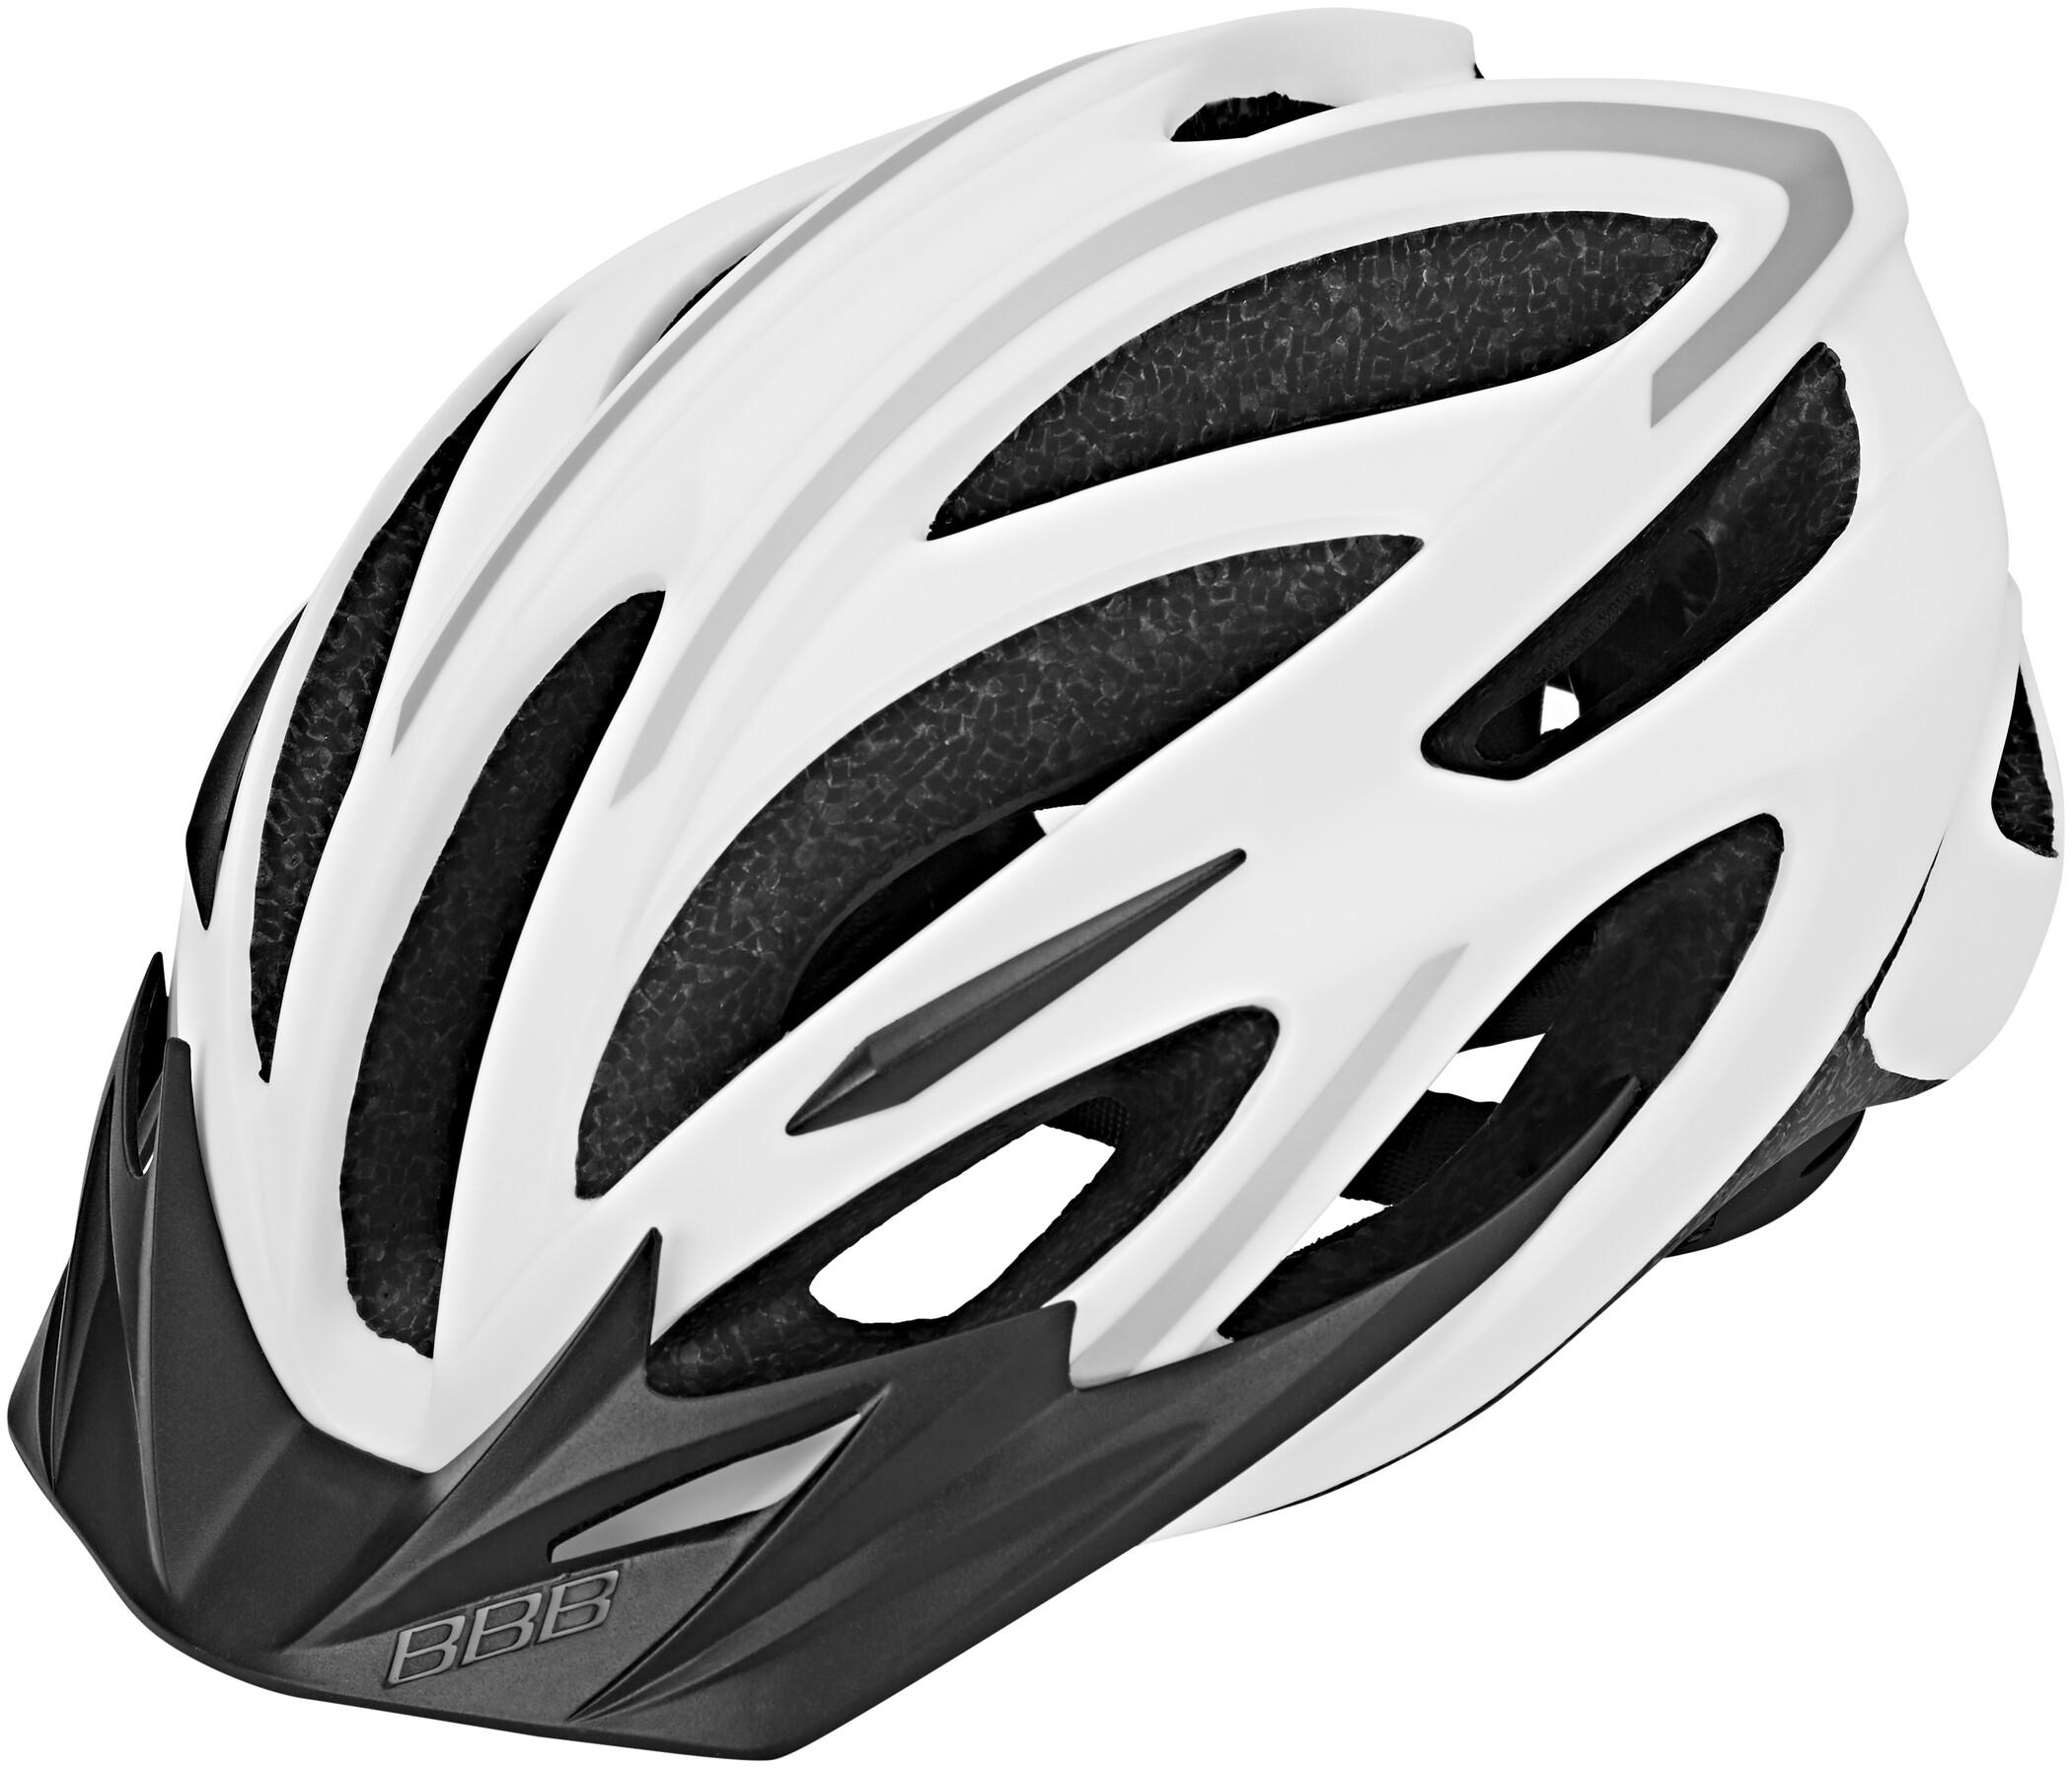 BBB Taurus BHE-26 Cykelhjelm, black (2019) | Helmets